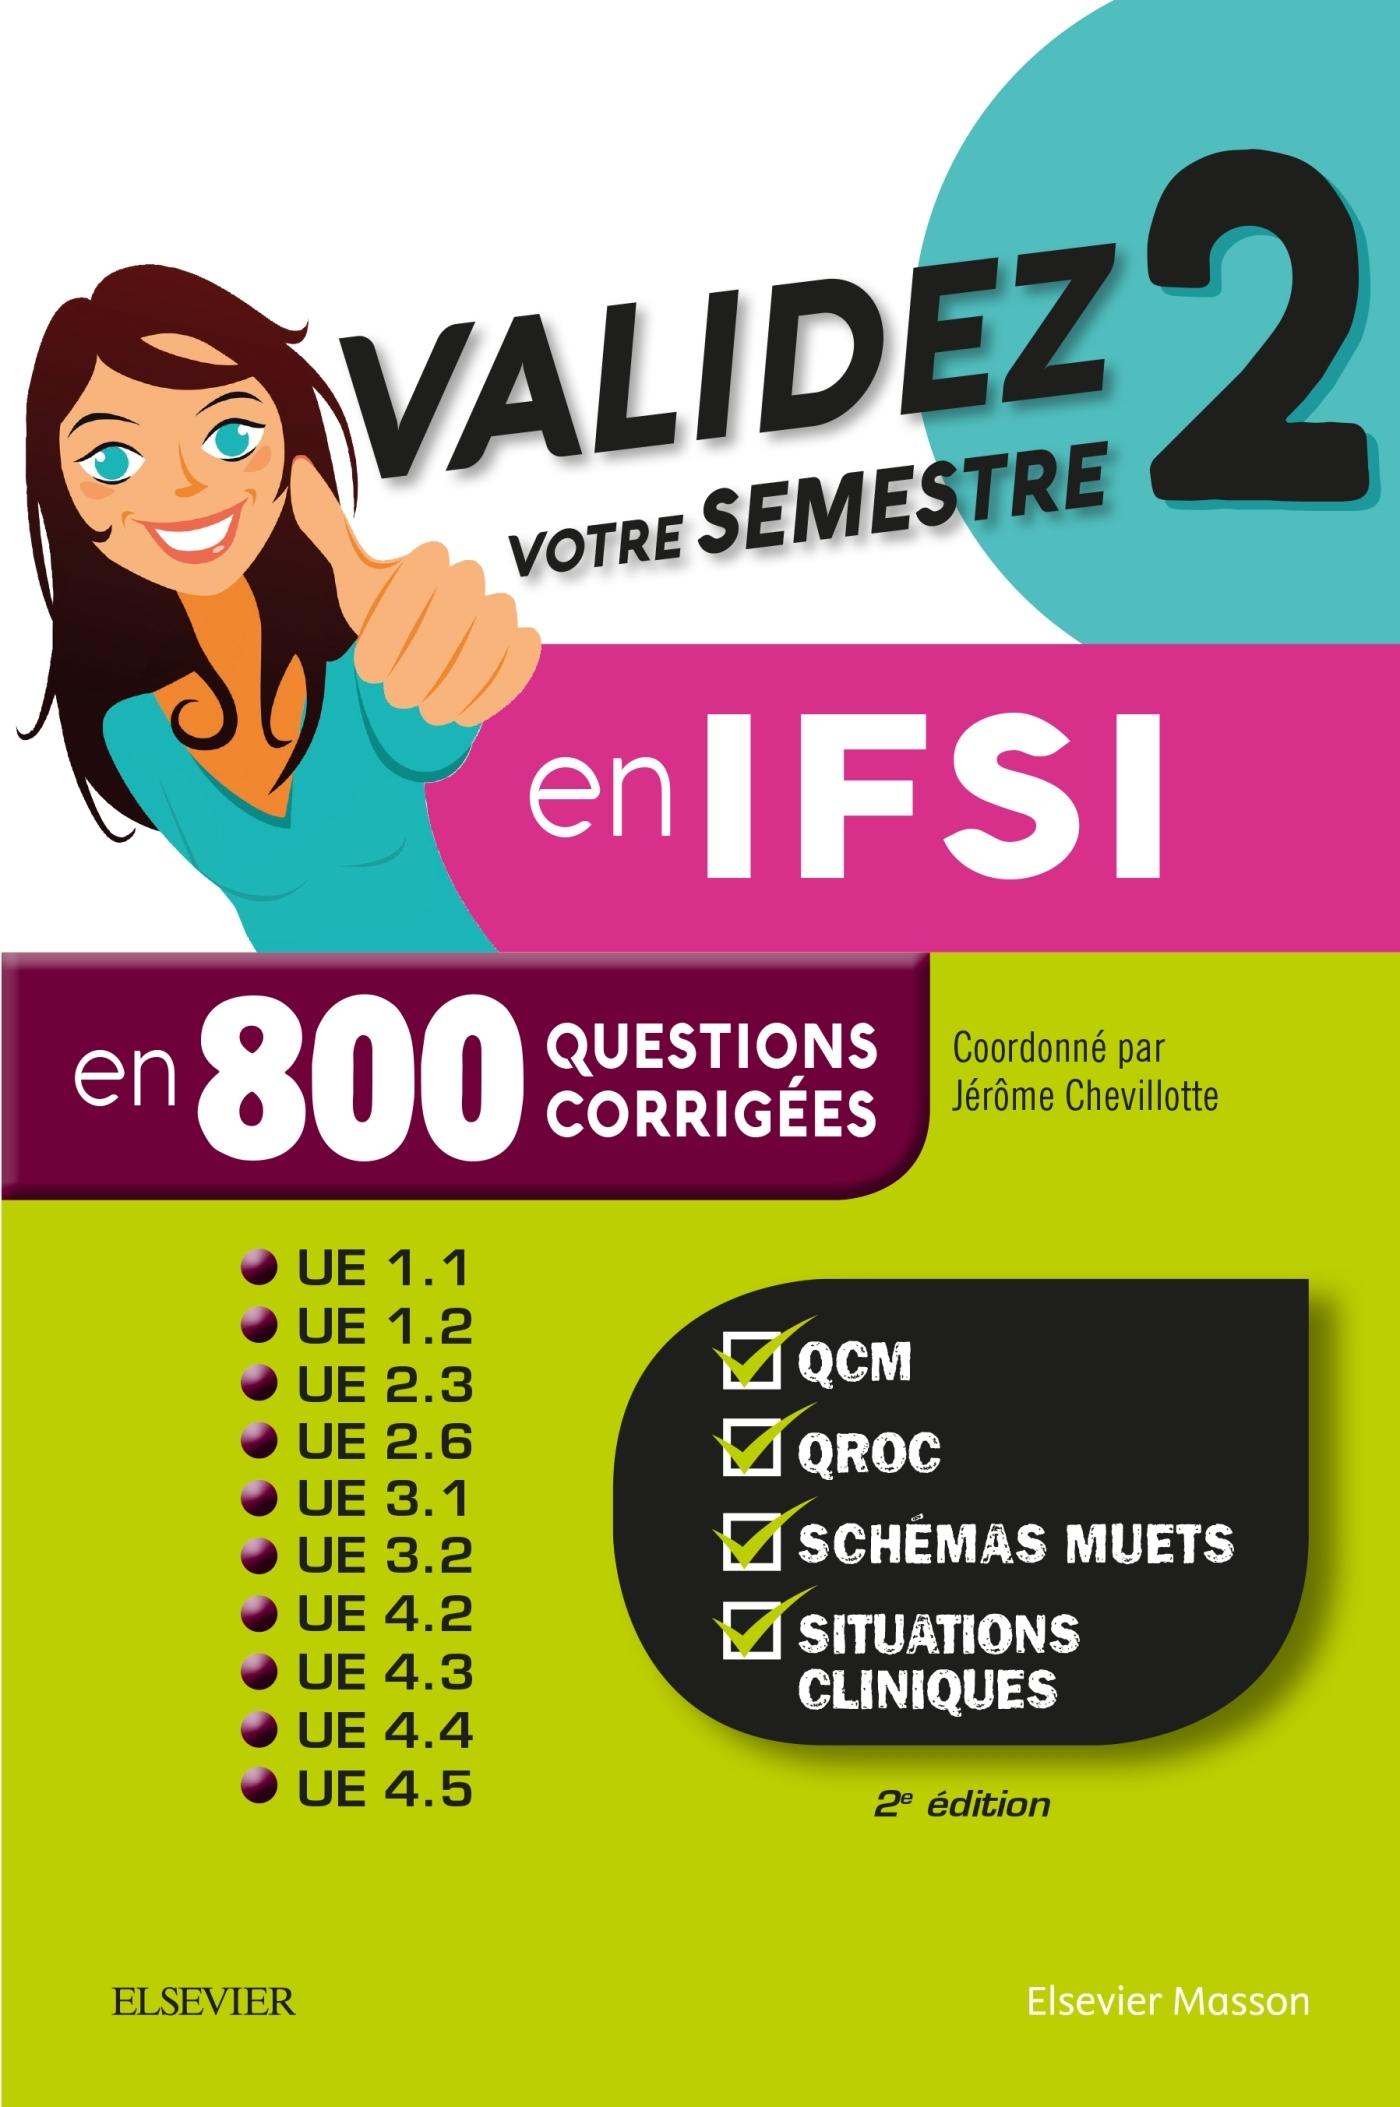 VALIDEZ VOTRE SEMESTRE 2 EN IFSI EN 800 QUESTIONS CORRIGEES